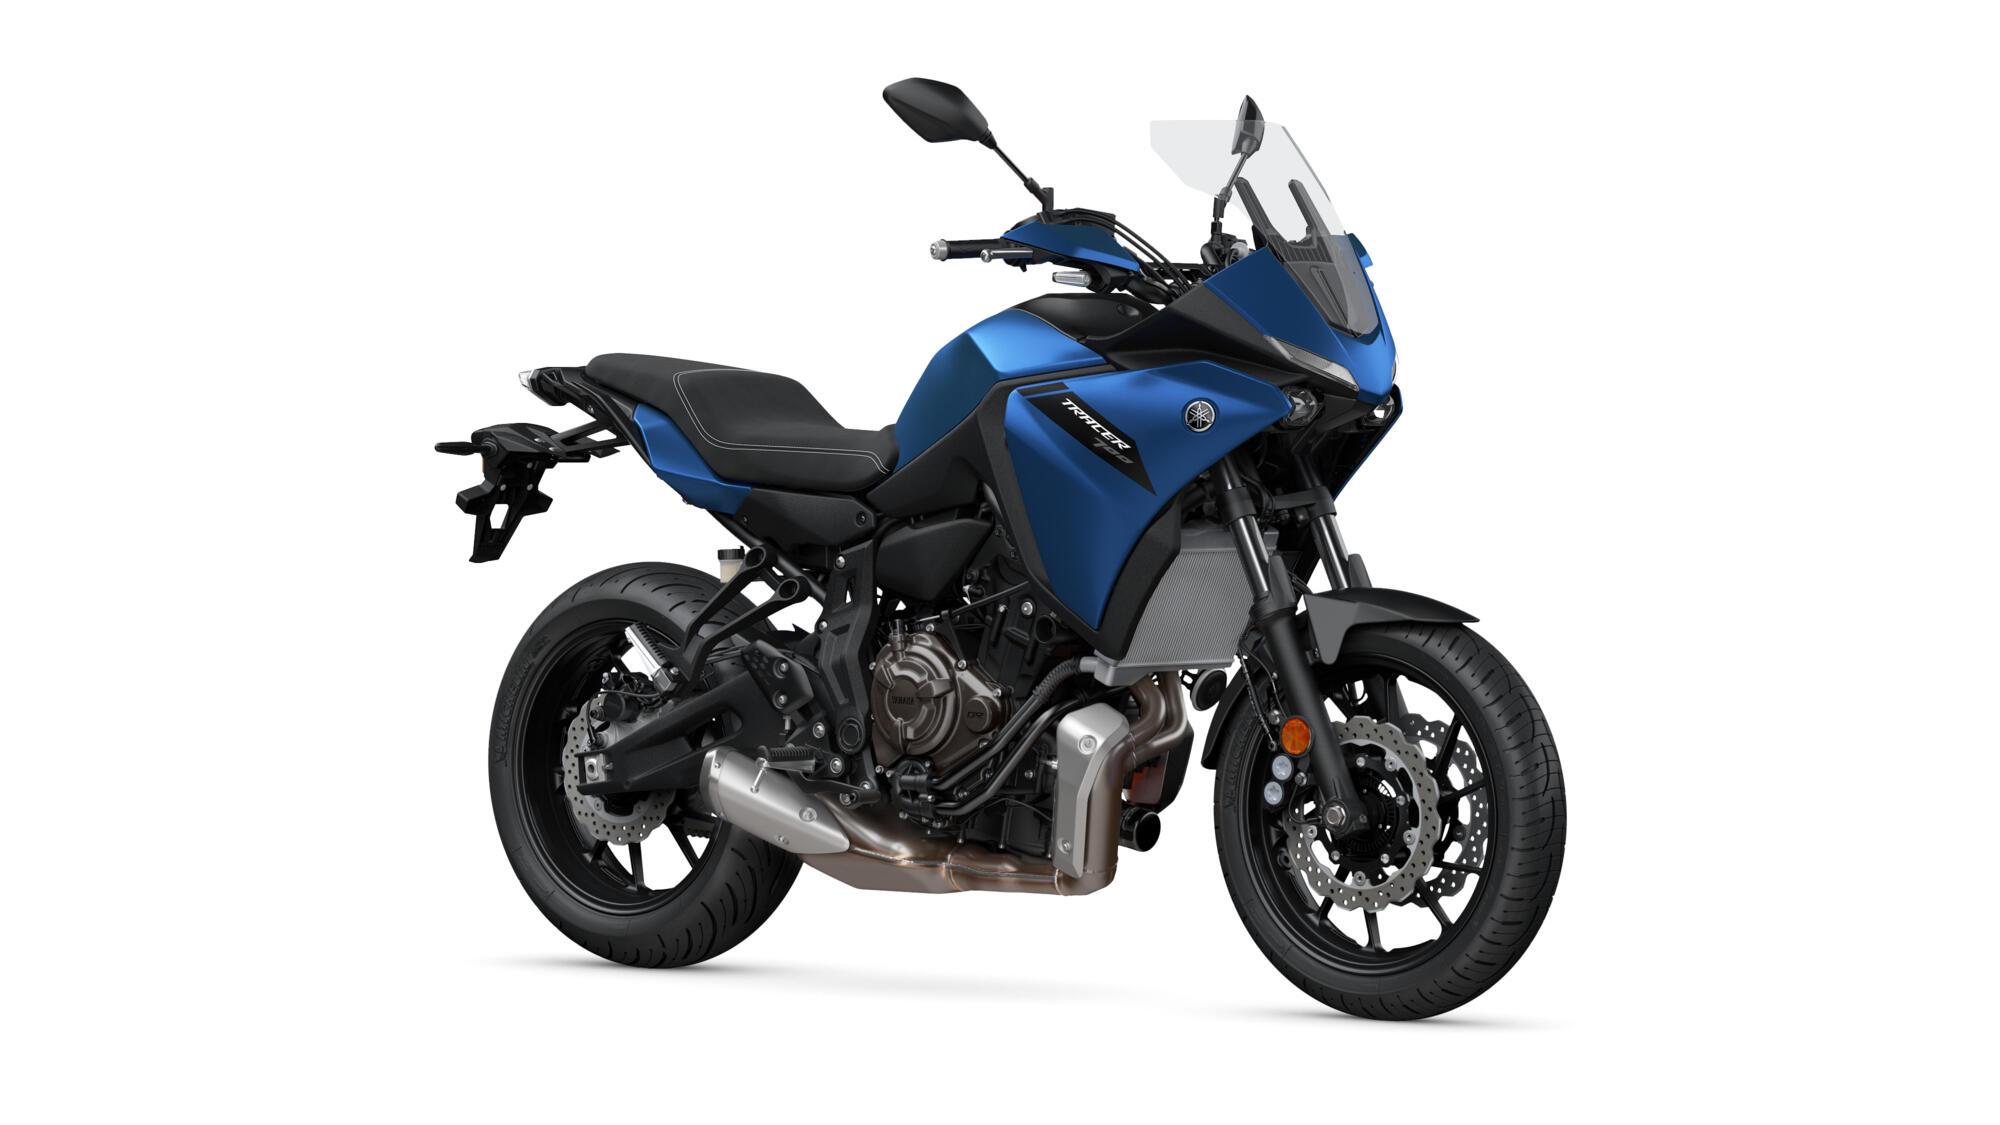 2020-Yamaha-MT07TR-EU-Phantom_Blue-Studio-001-03.jpg